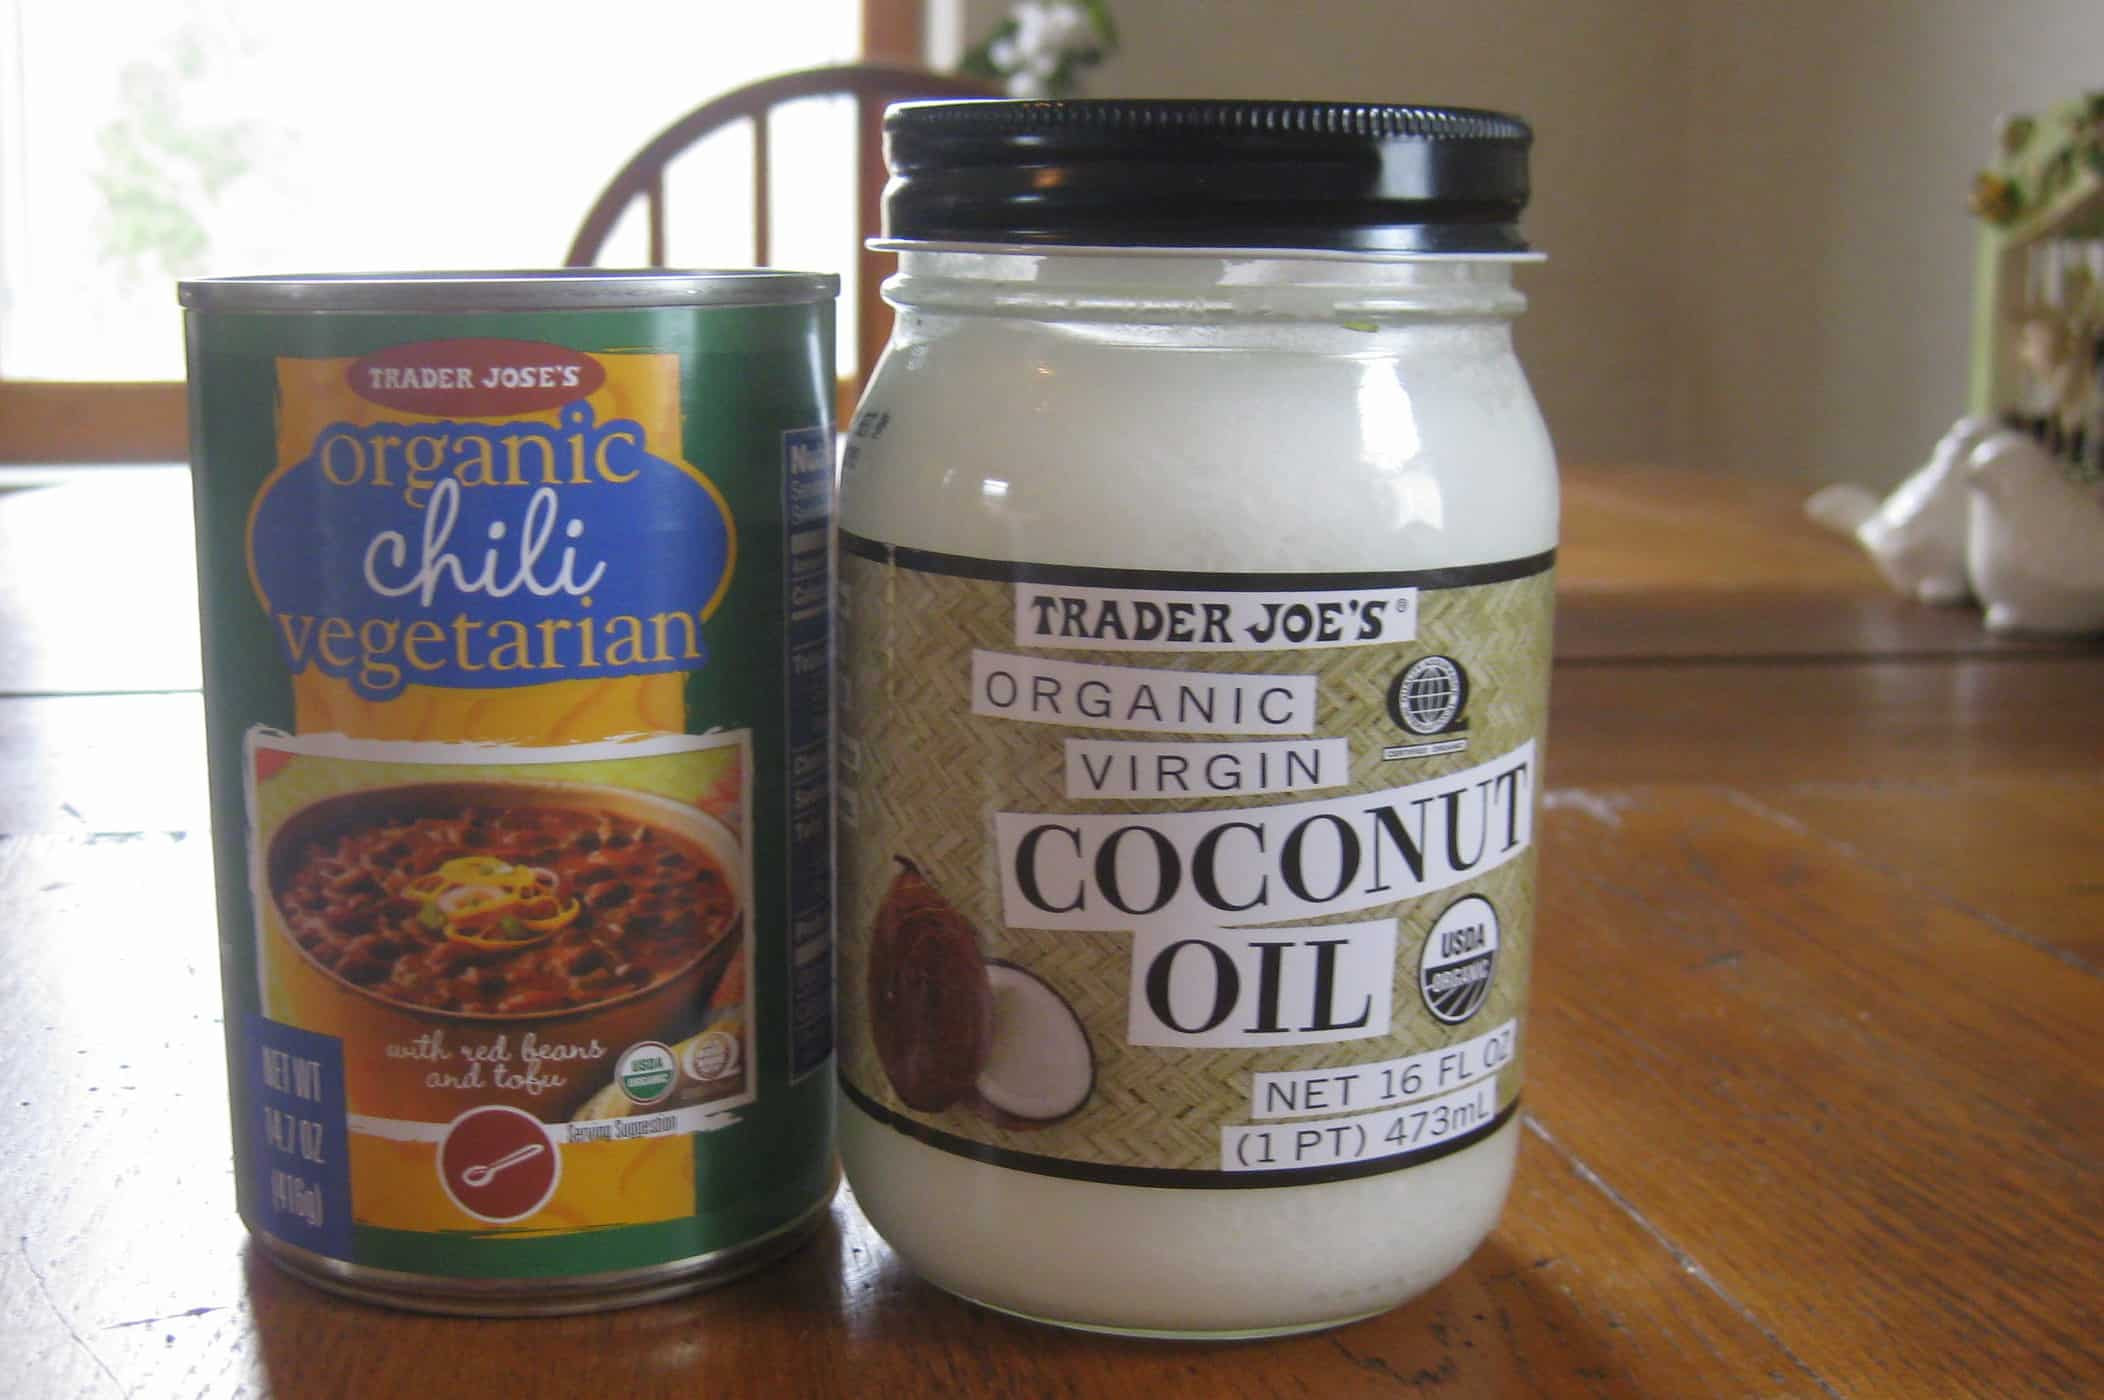 Trader Joe'S Organic Vegetarian Chili  Trader Joe s organic ve arian chili and coconut oil